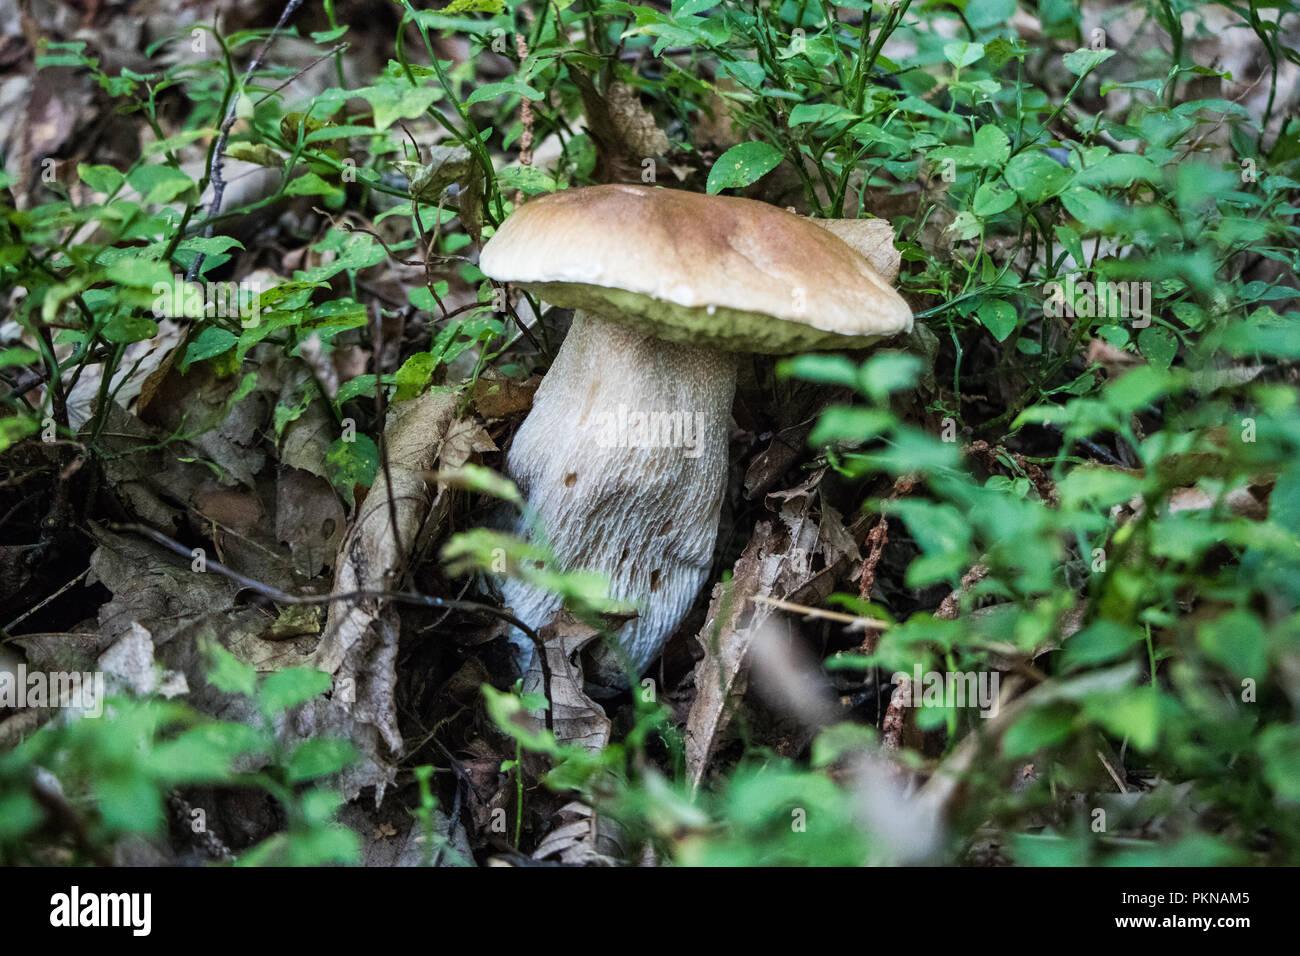 Funghi Porcini Fungi in the Woods Mushrooms Mycology - Stock Image